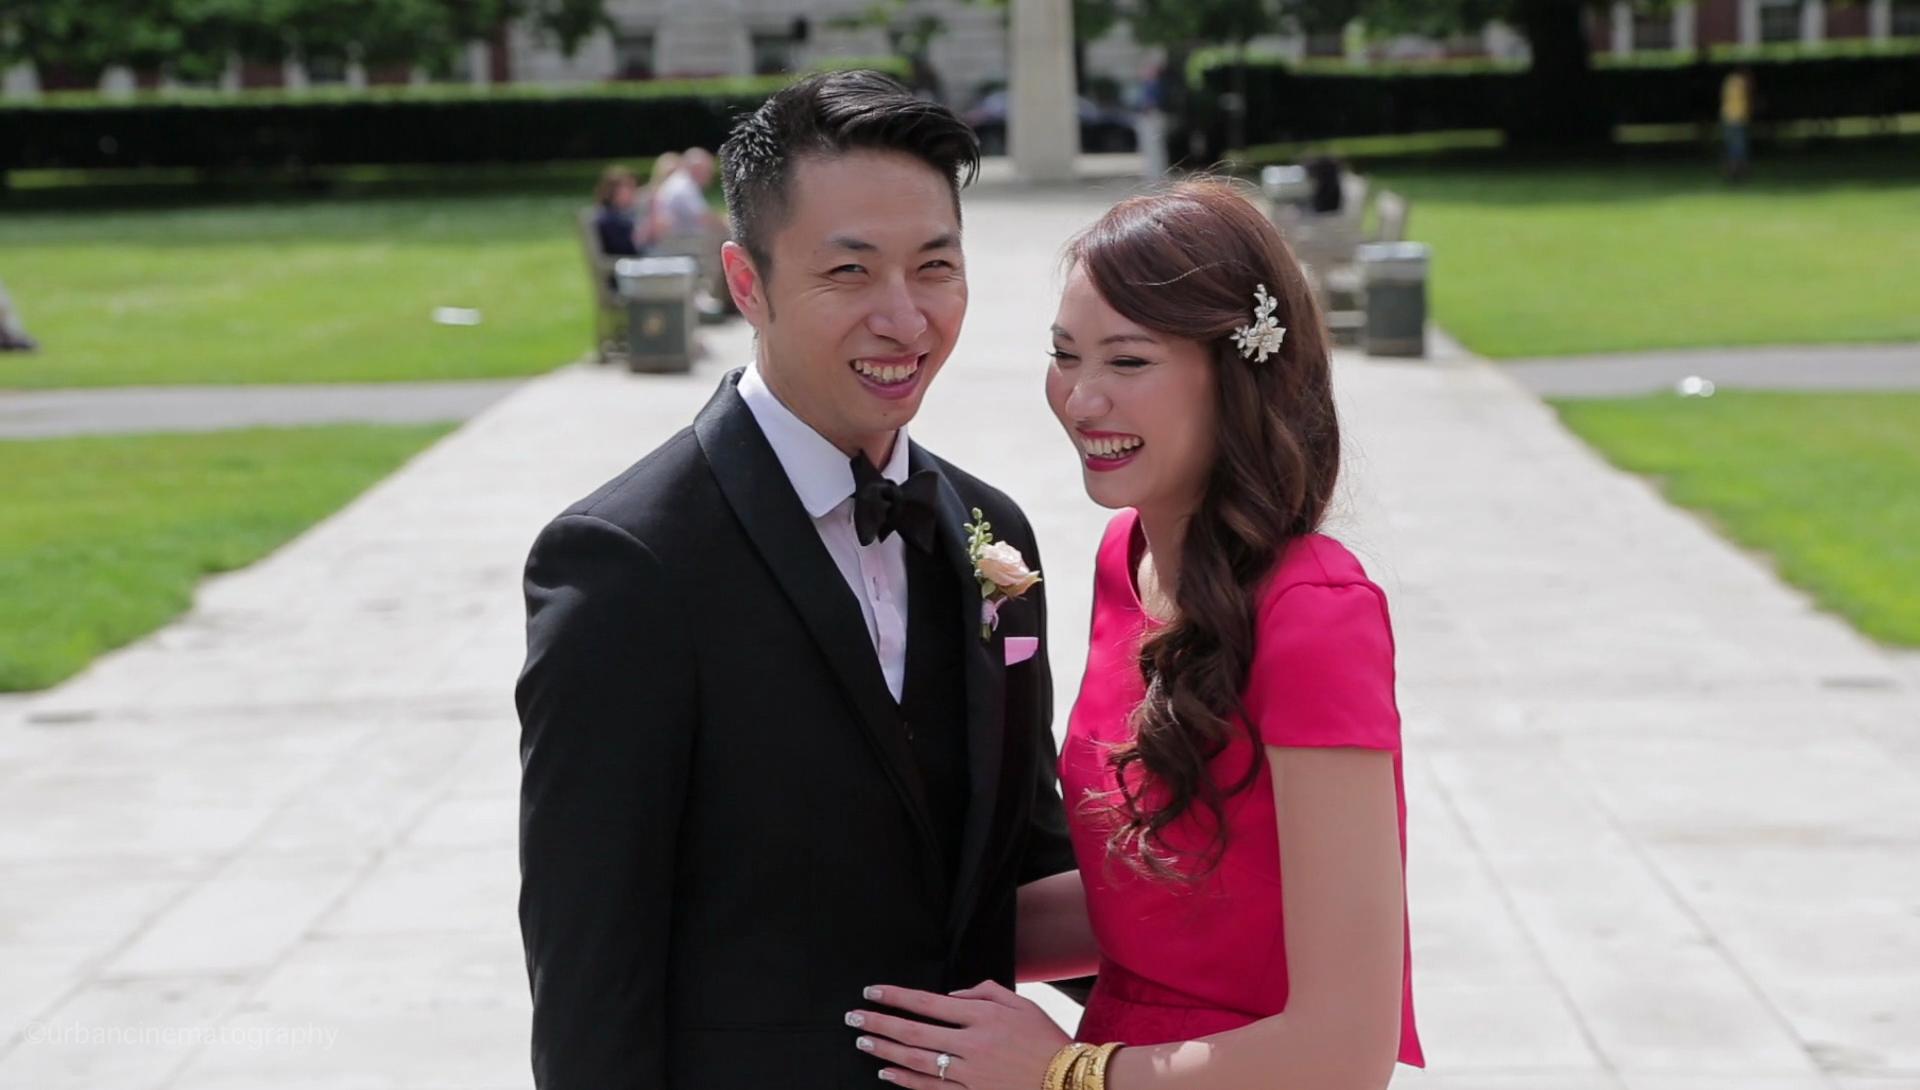 Grosvenor Square Wedding Videography London